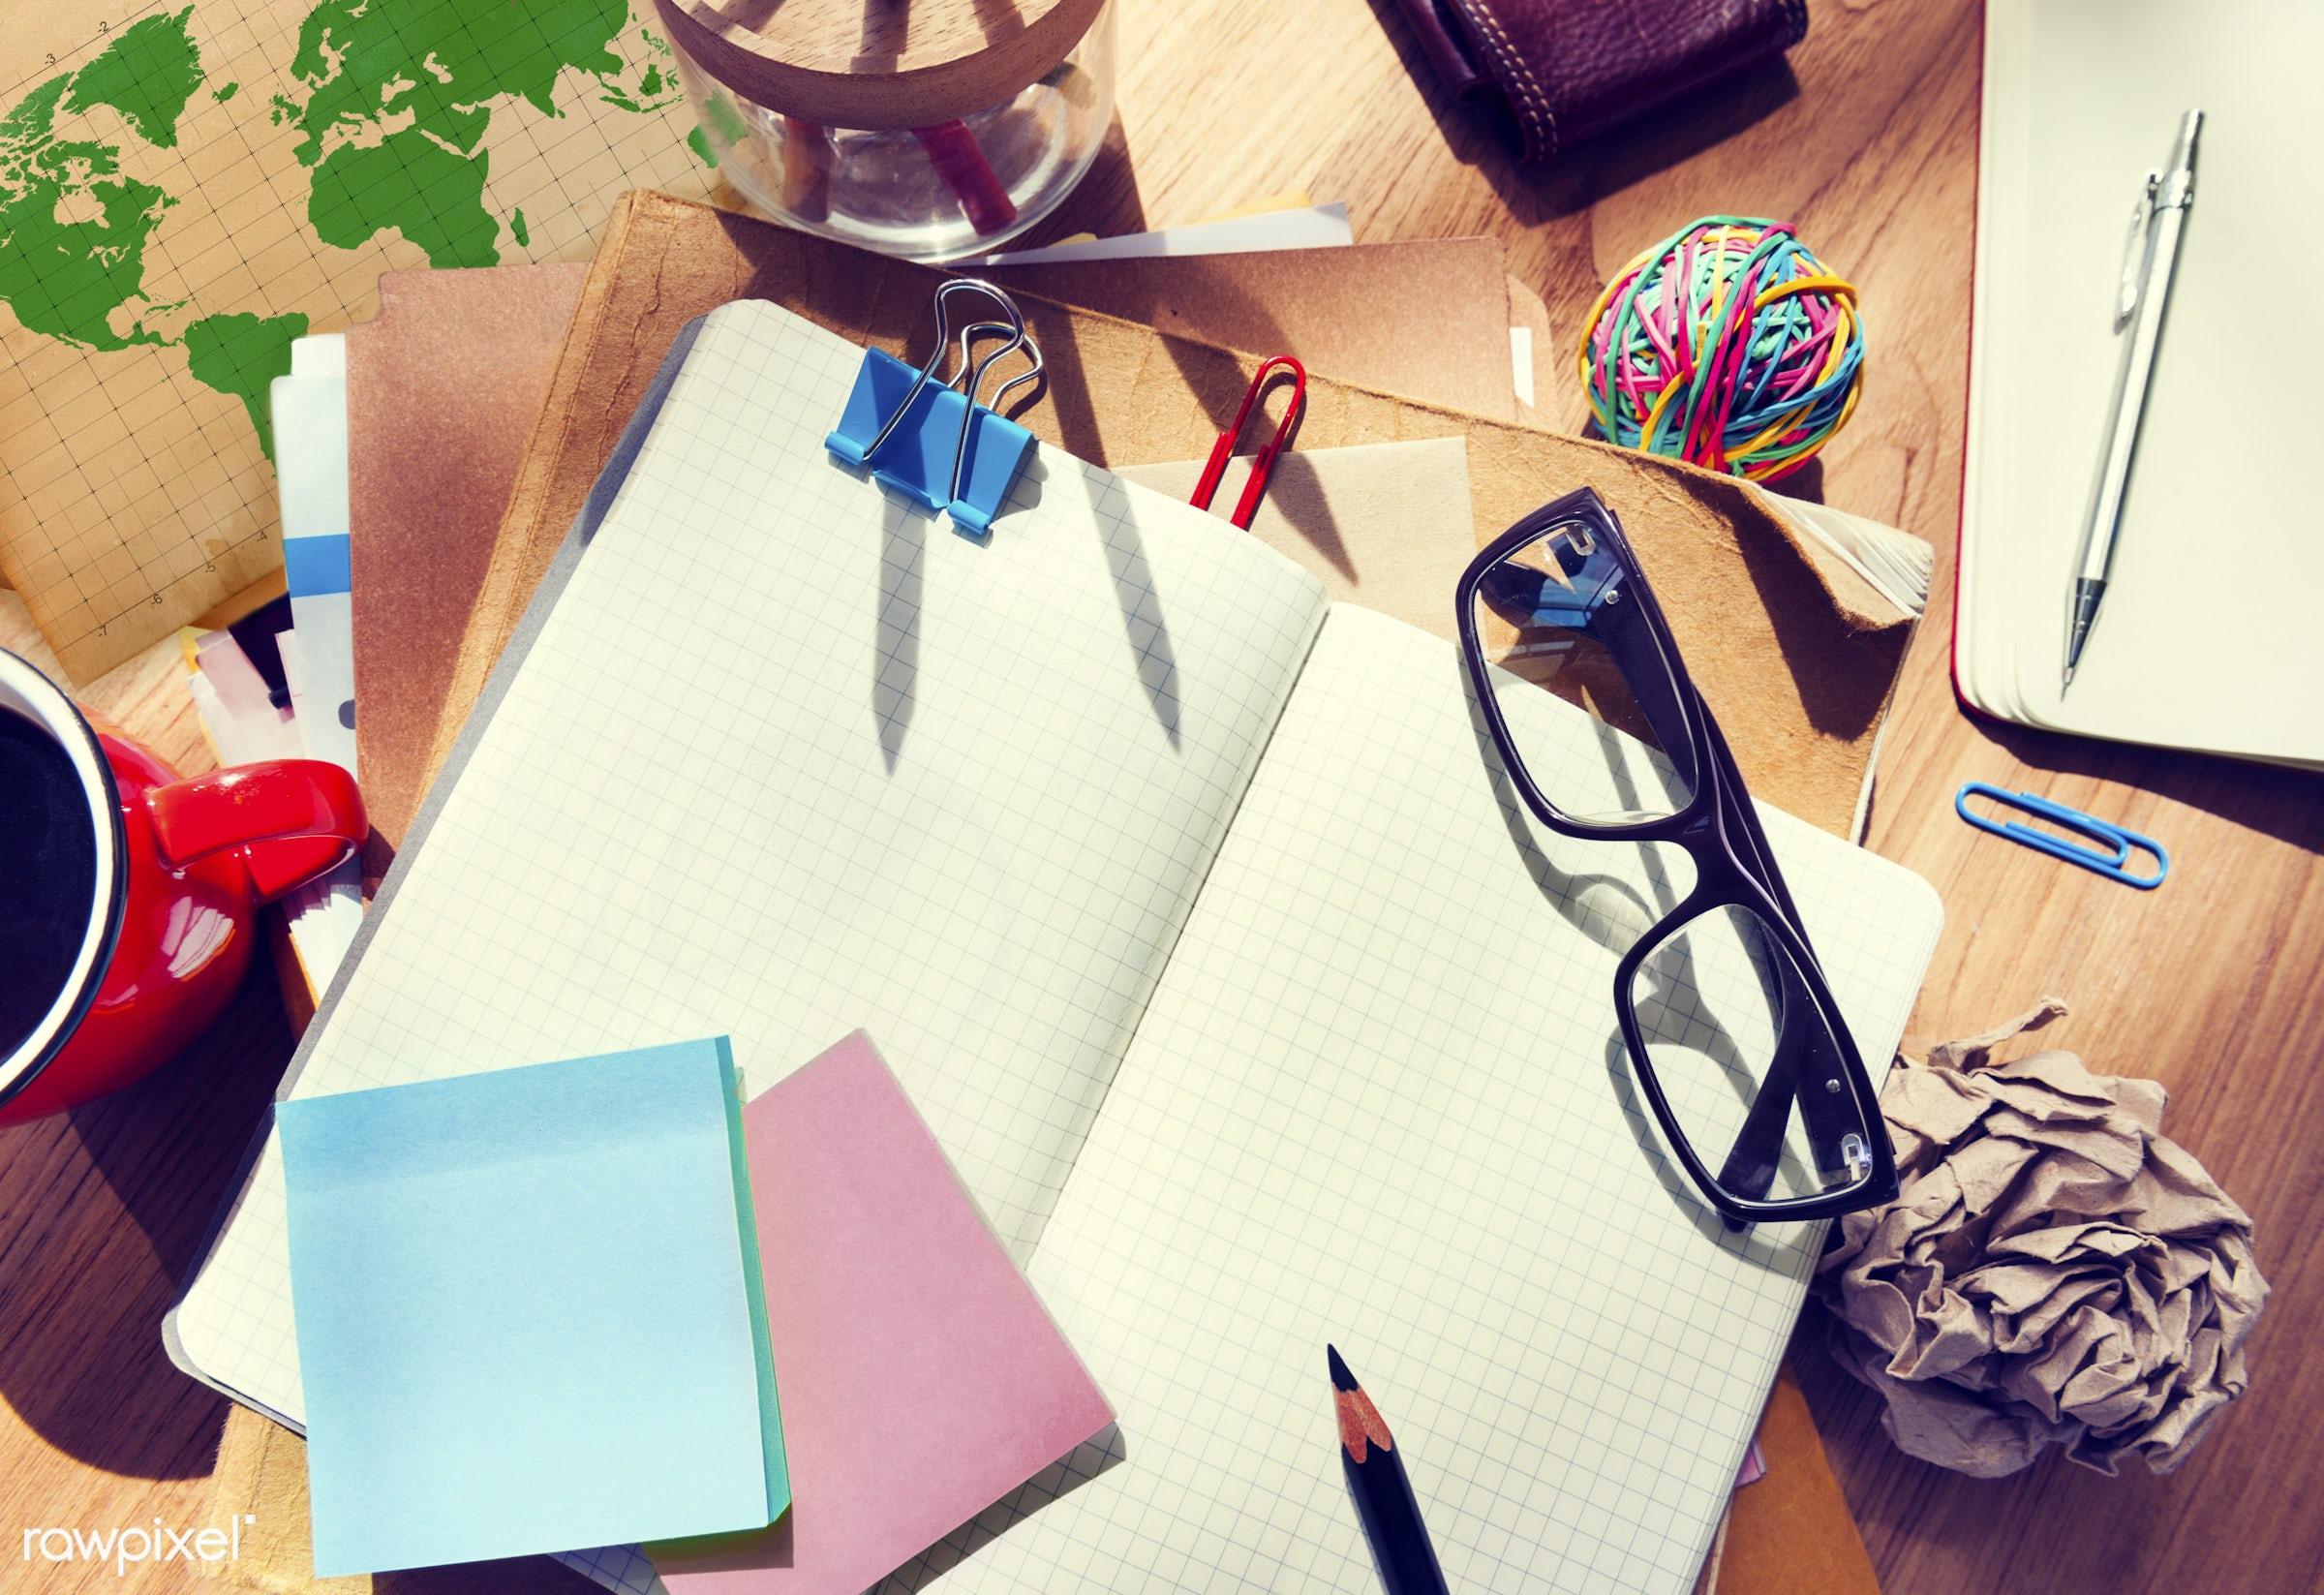 architect, architectural tools, architecture, calculator, coffee, concept, copy space, creative occupation, creativity,...